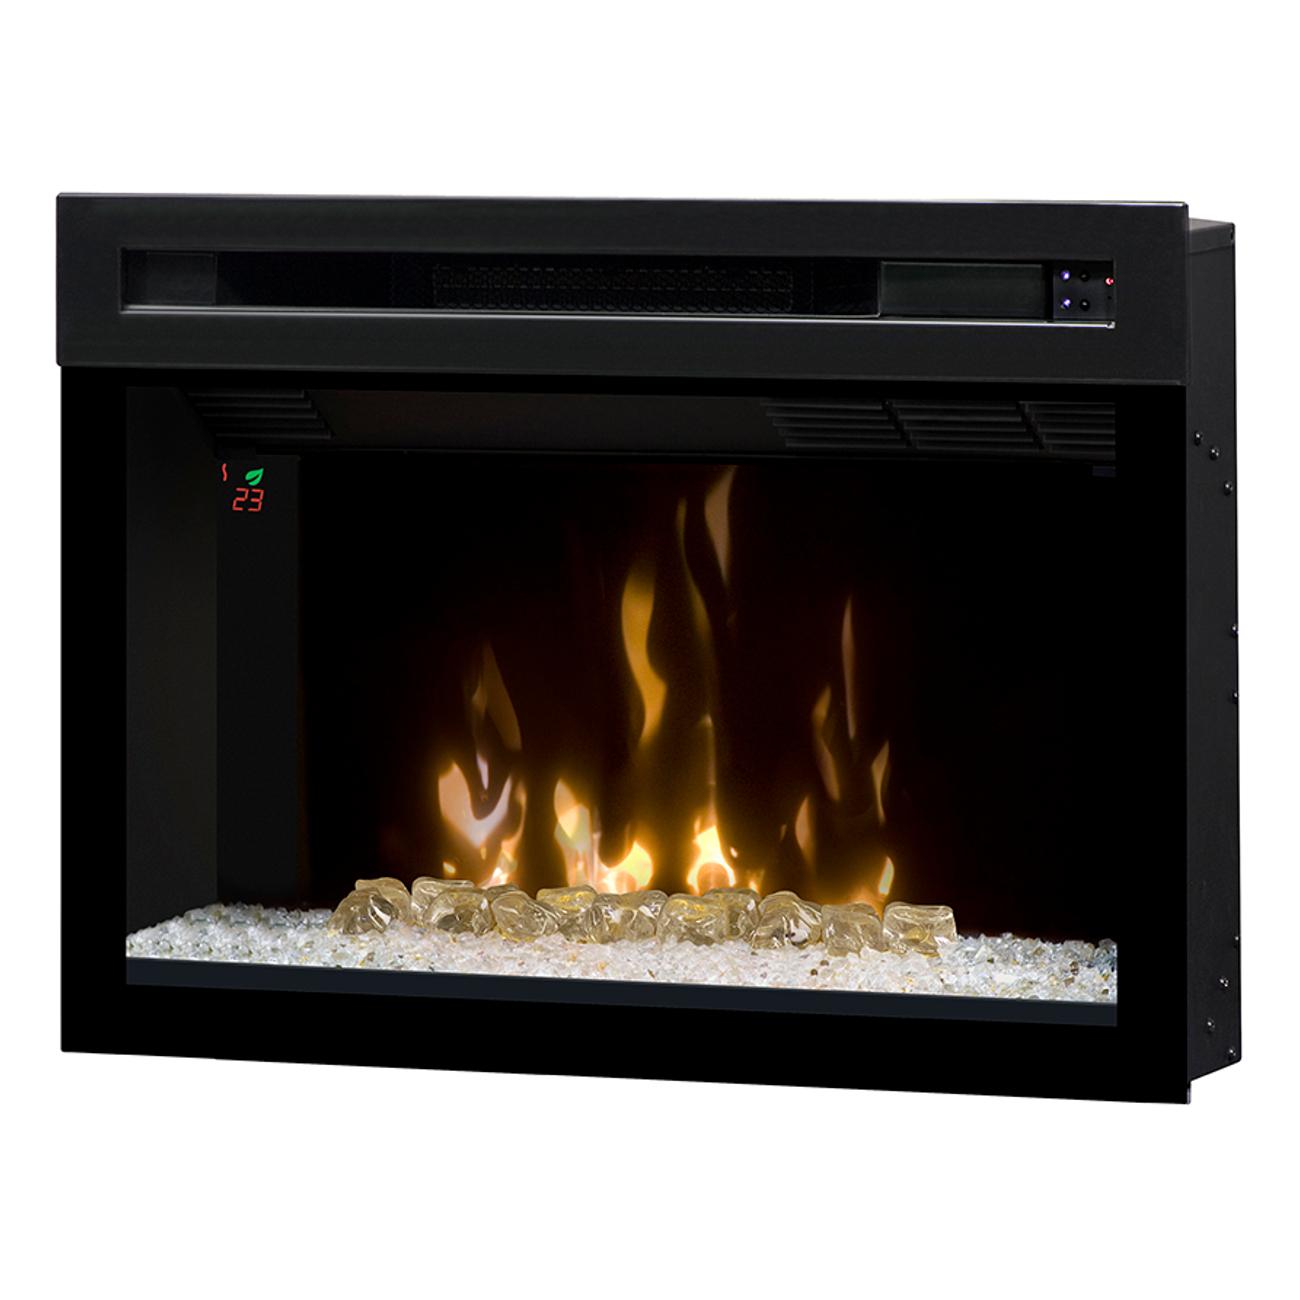 dimplex-25-inch-multifire-electric-fireplace-insert-PF2325HG